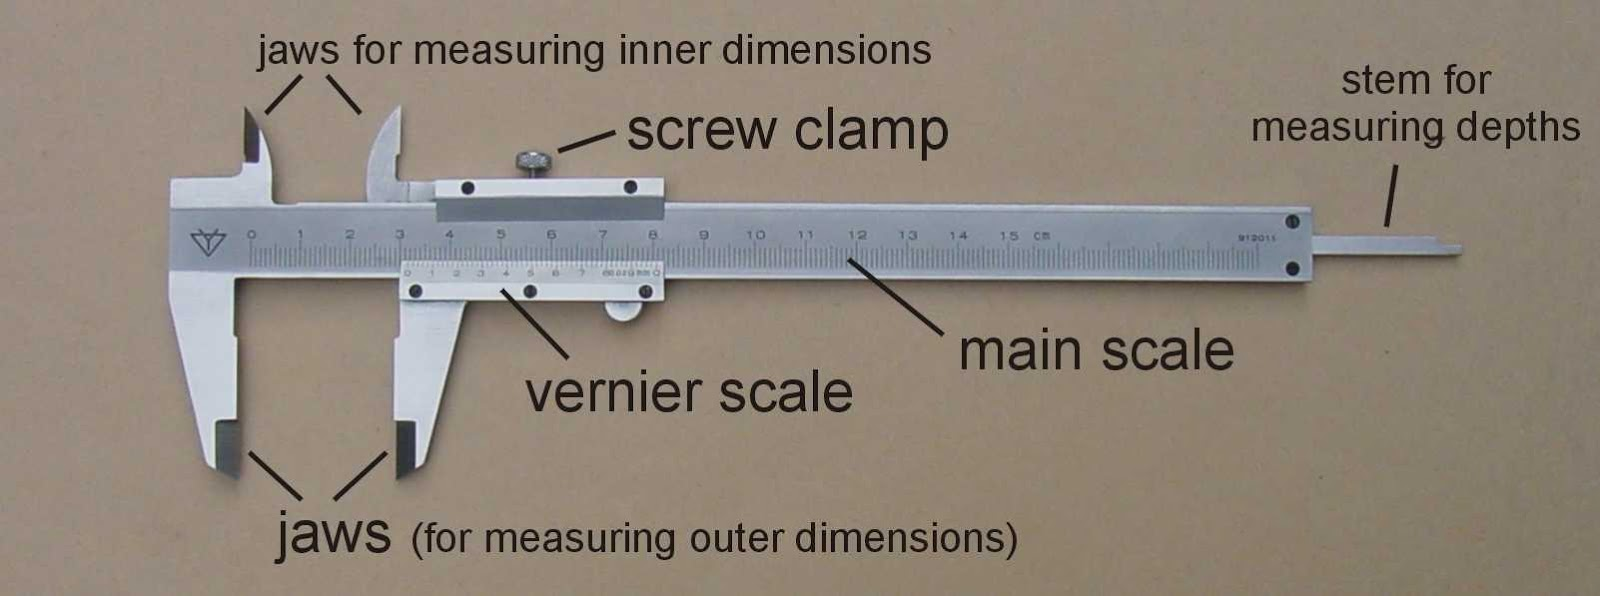 vernier caliper, micrometer and other length measuring devices Vernier Caliper Tutorial